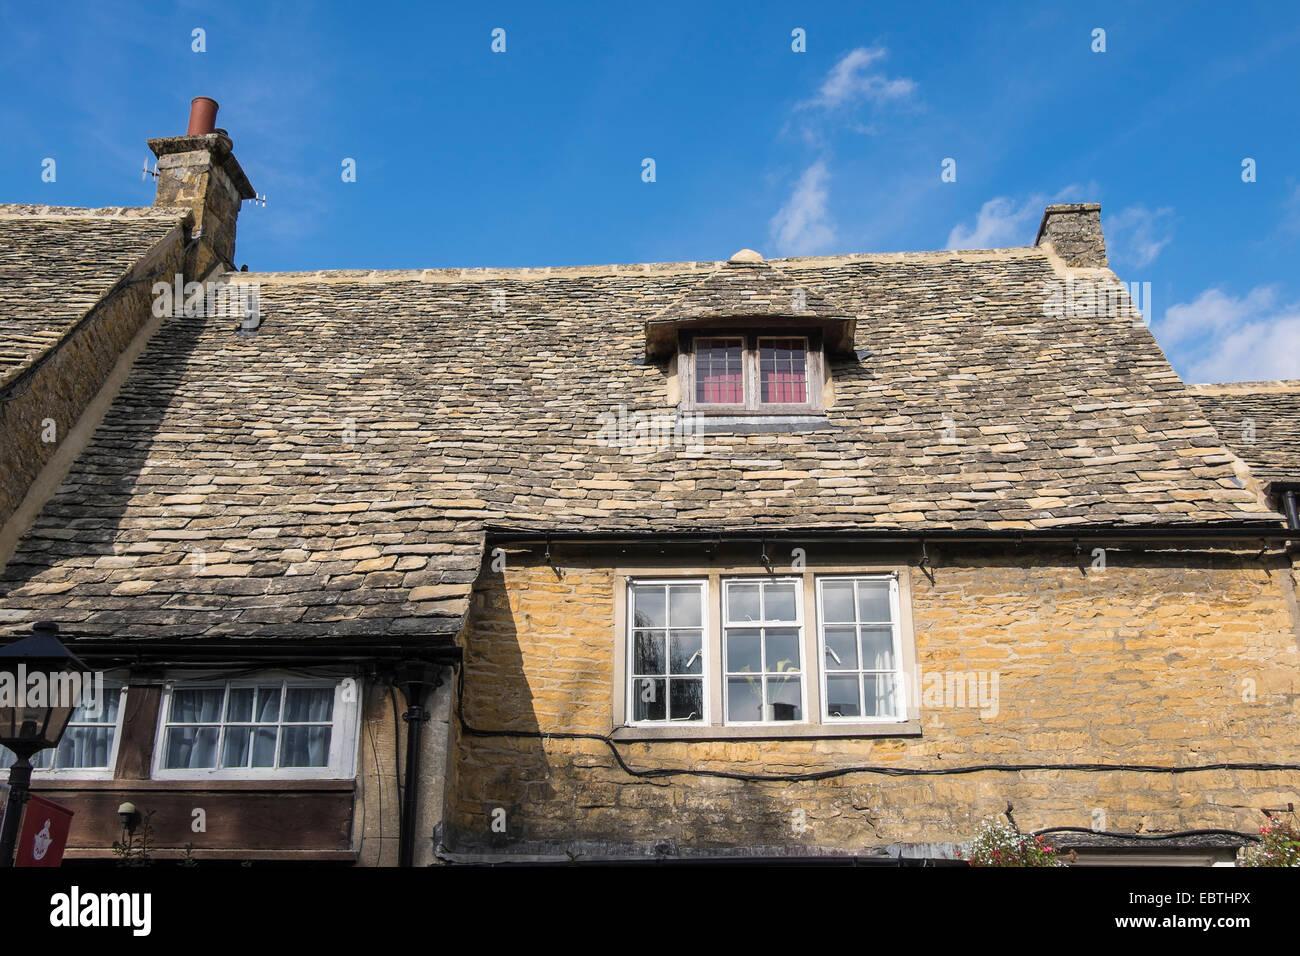 cotswold-stone-roof-tiles-dormer-window-bourton-on-the-water-cotswolds-EBTHPX.jpg